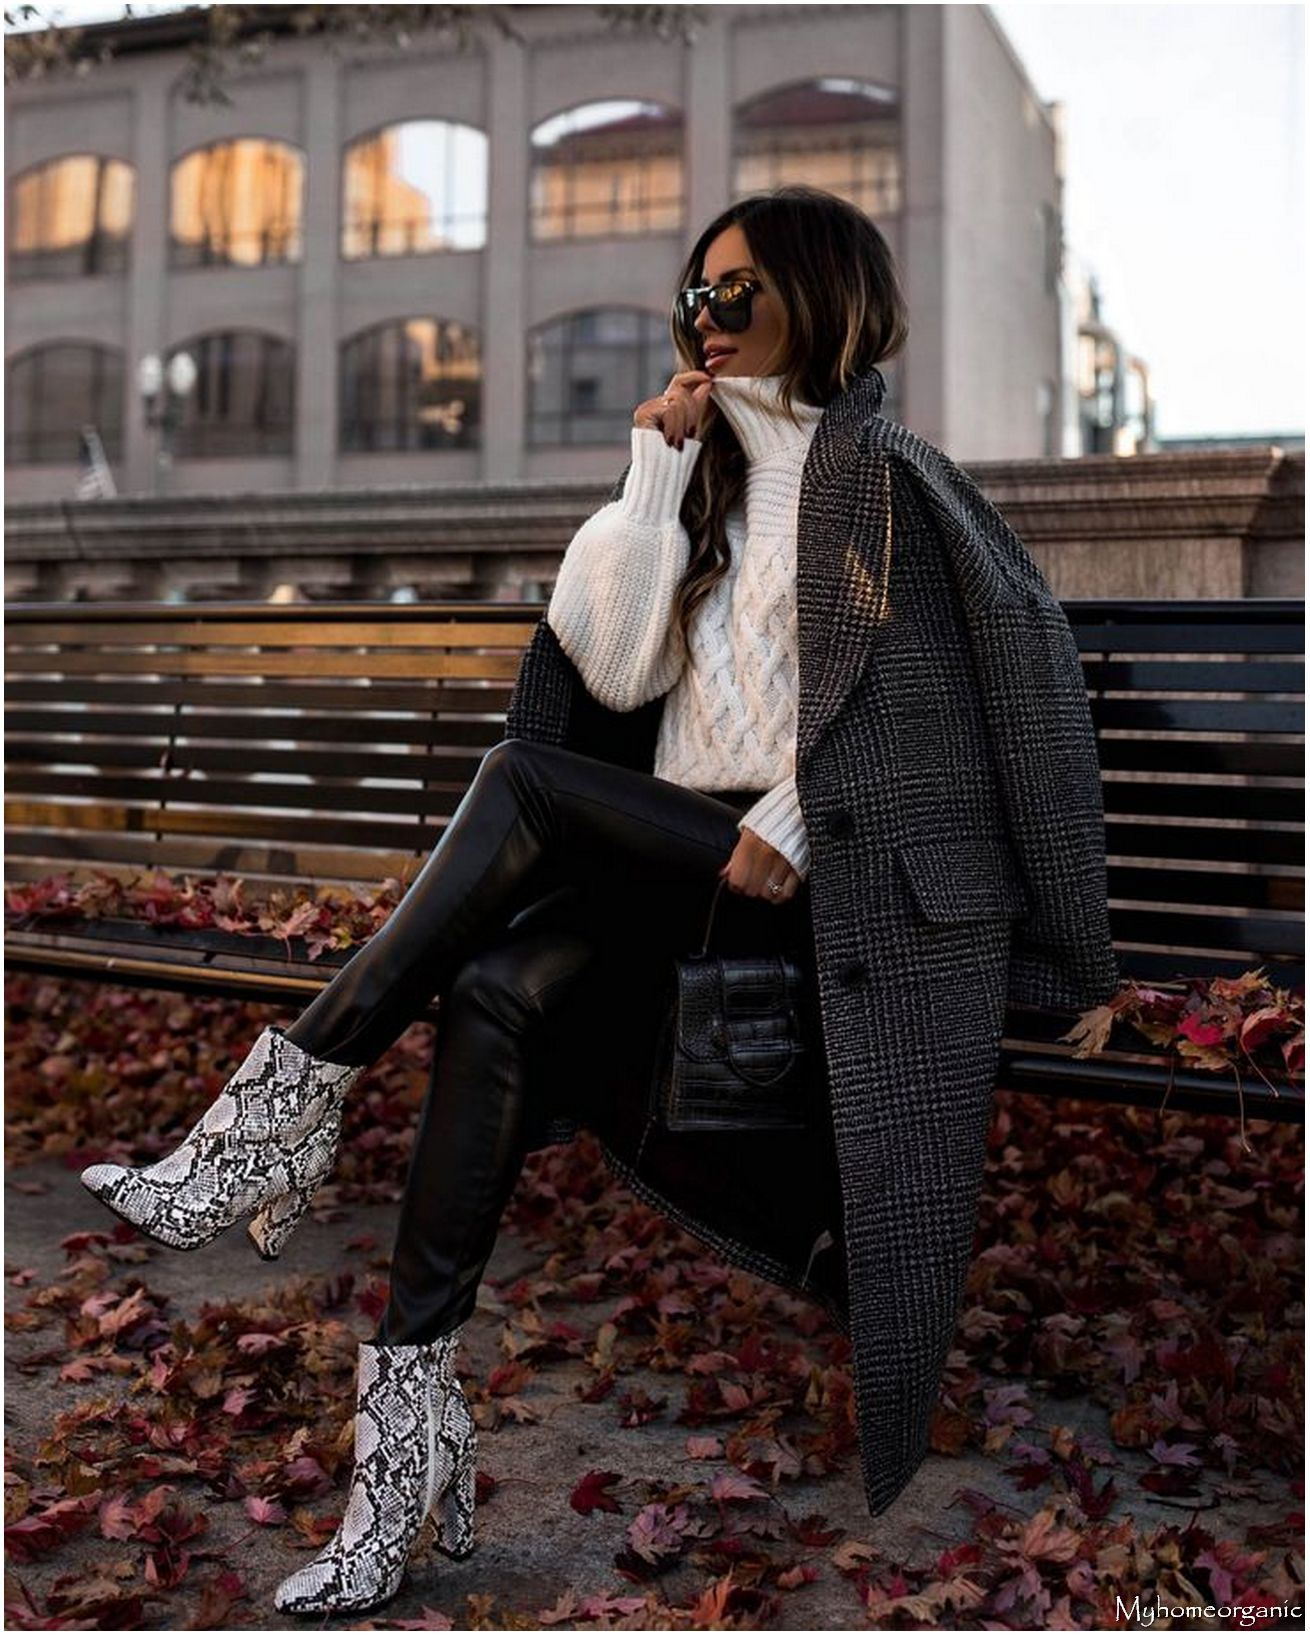 Everyday Wear - Casual Winter Leggings